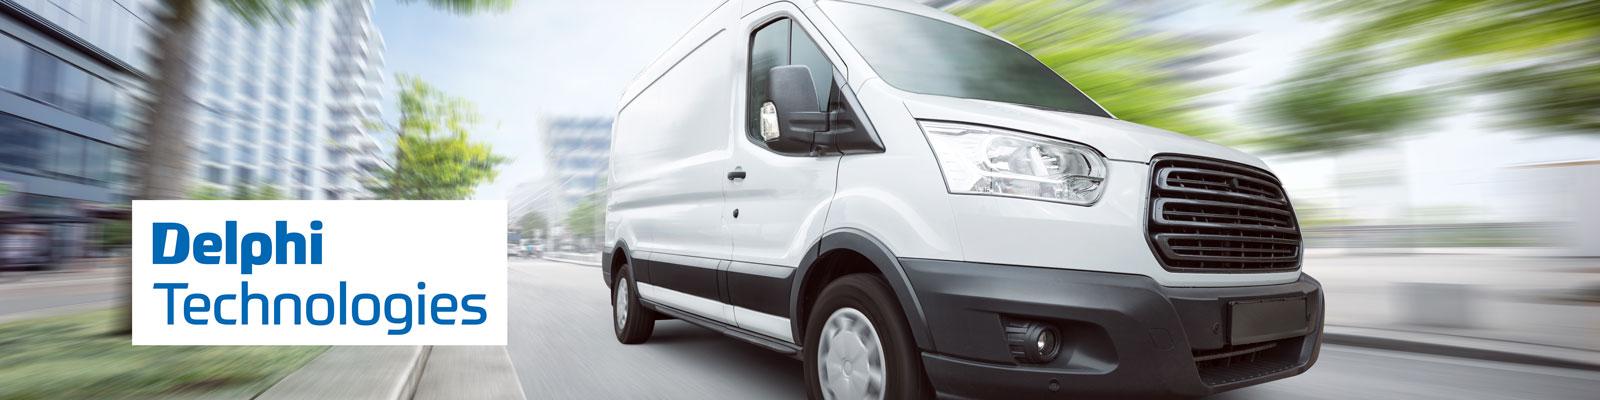 Delphi Fuel Injectors and Pumps for Diesel Cars Vans and Trucks